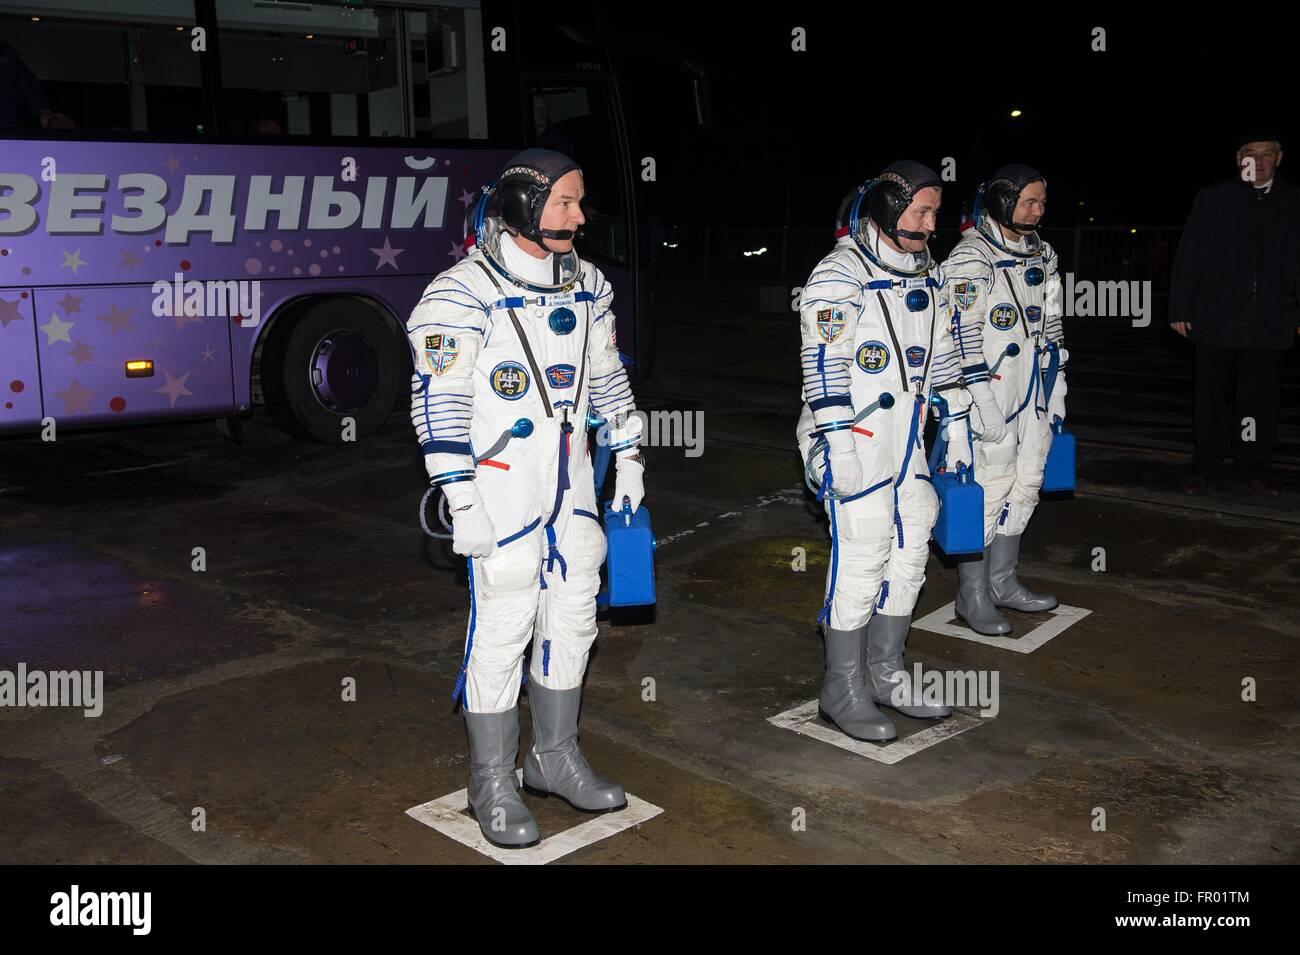 Baikonur, Kazakhstan. 19th Mar, 2016. International Space Station Expedition 47 American astronaut Jeff Williams, - Stock Image